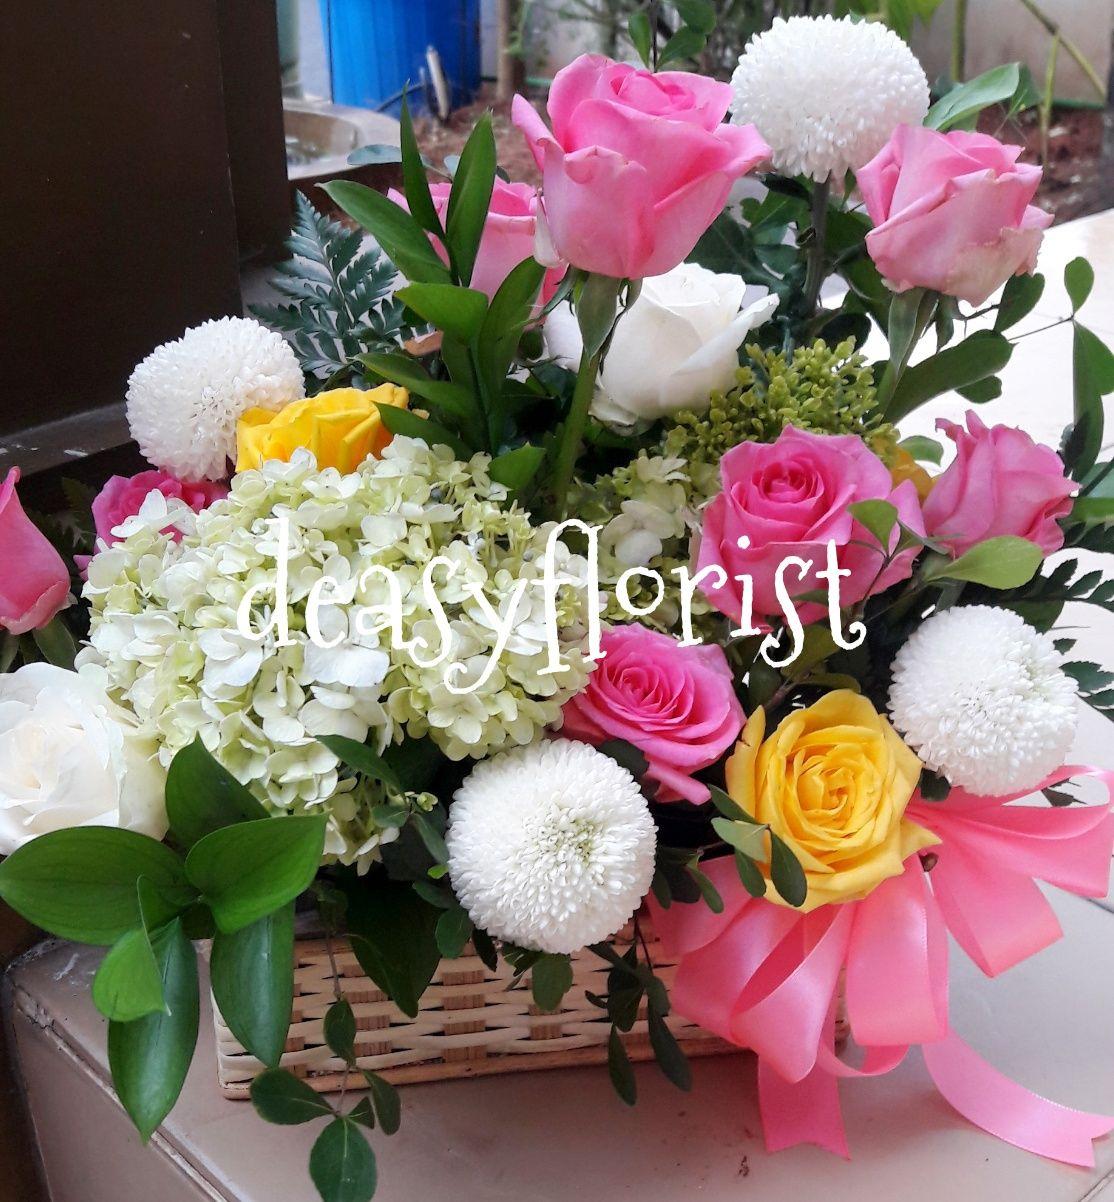 Bunga Vas Bunga Pot Bunga Keranjang Bunga Box Bunga Pot Bunga Vas